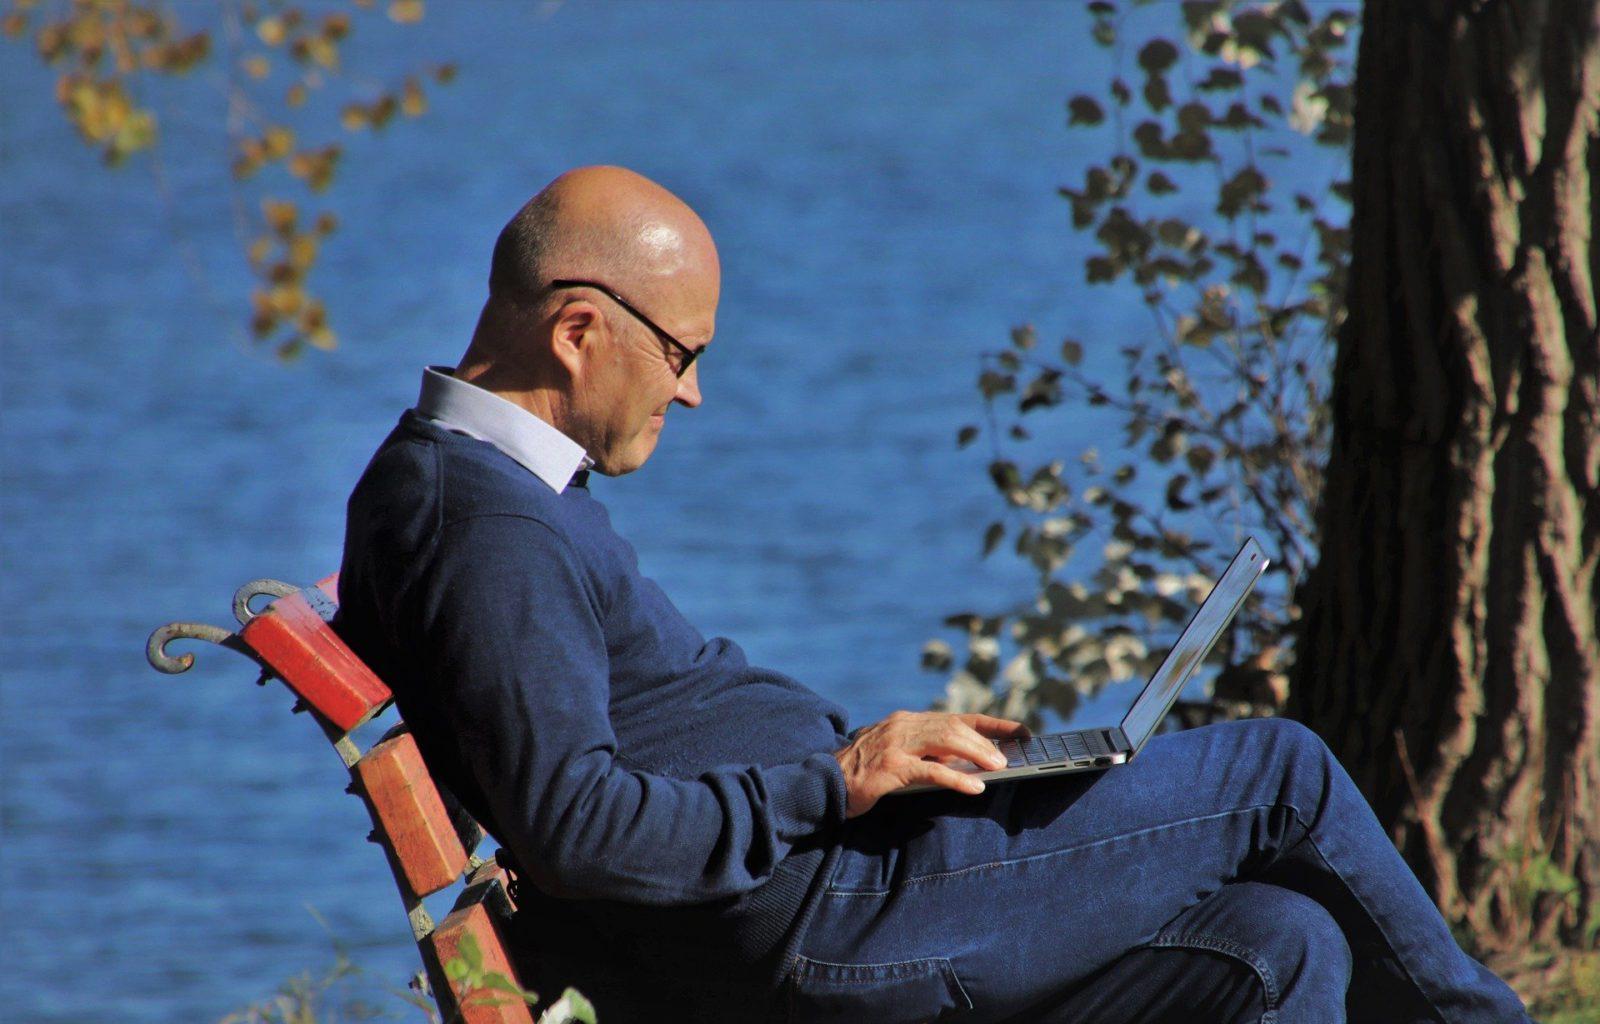 Elderly Man sitting on a bench beside the sea